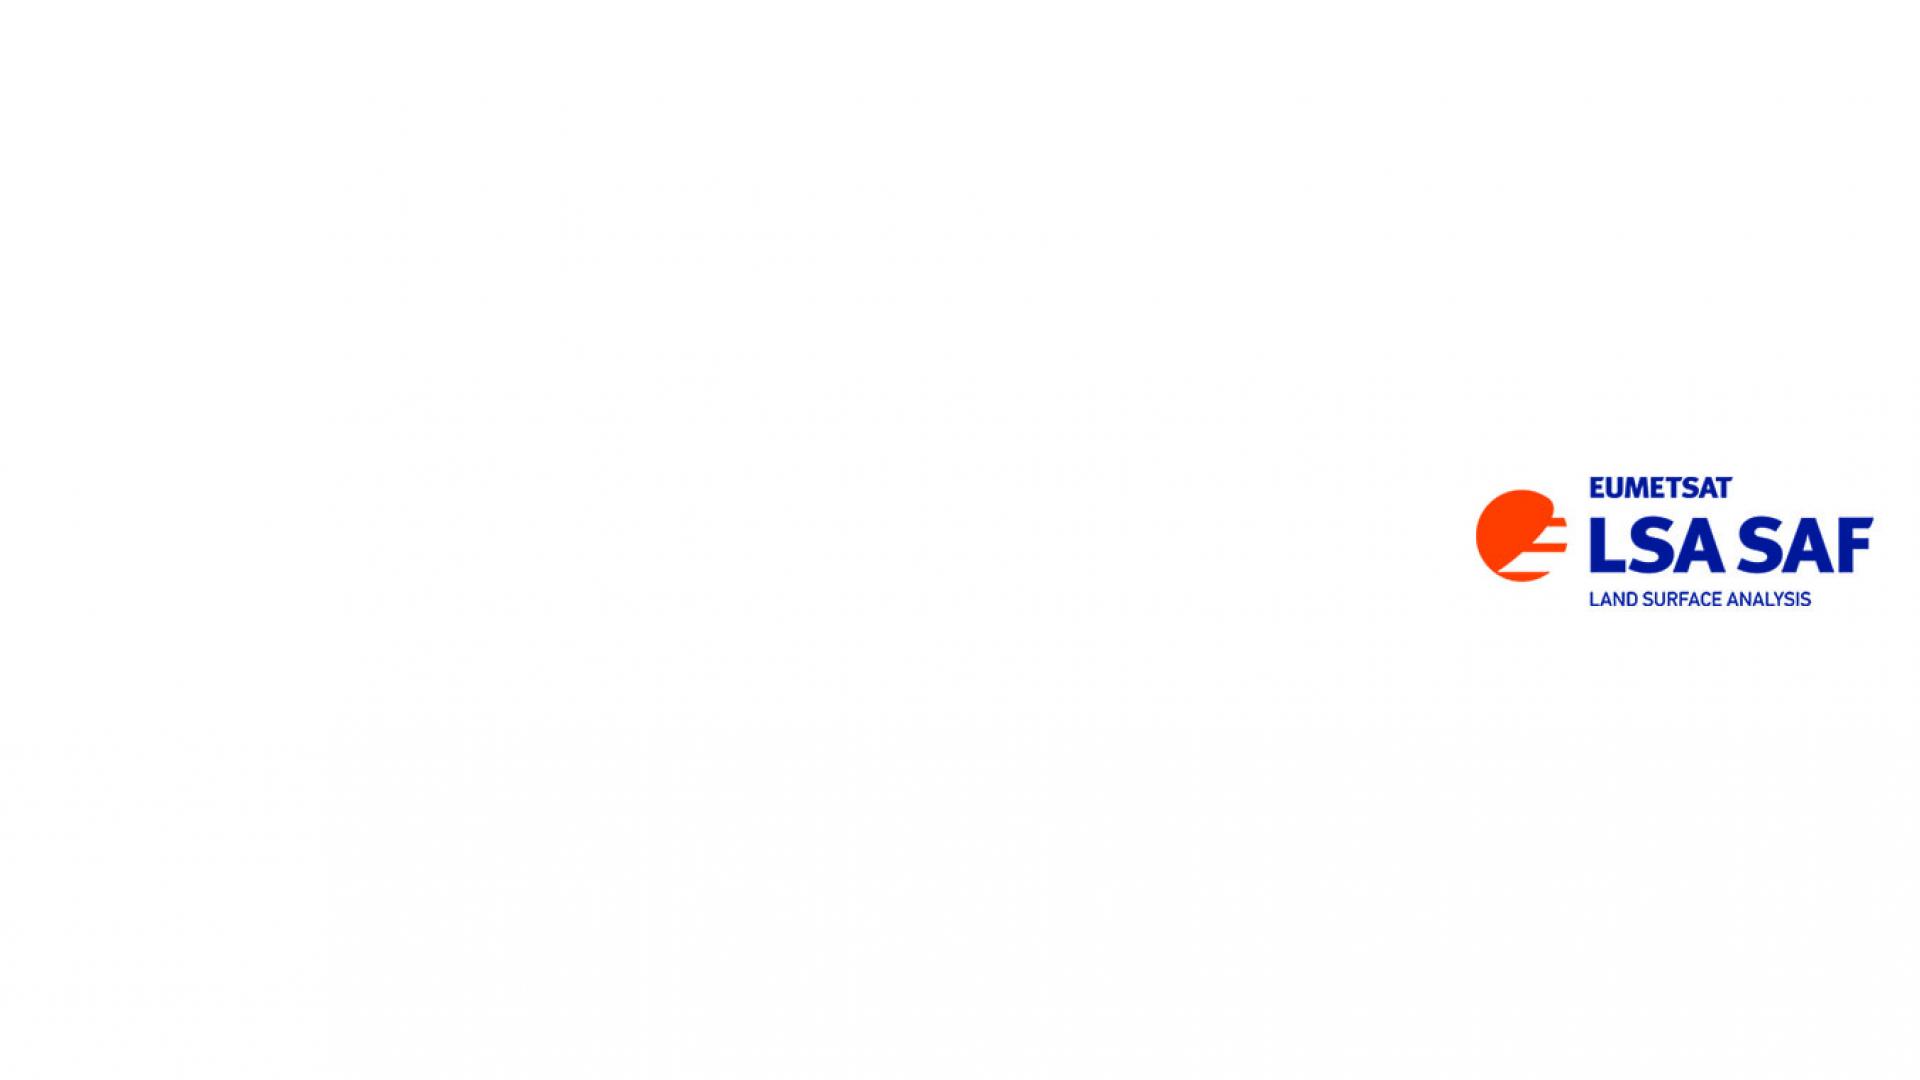 LSA SAF logo